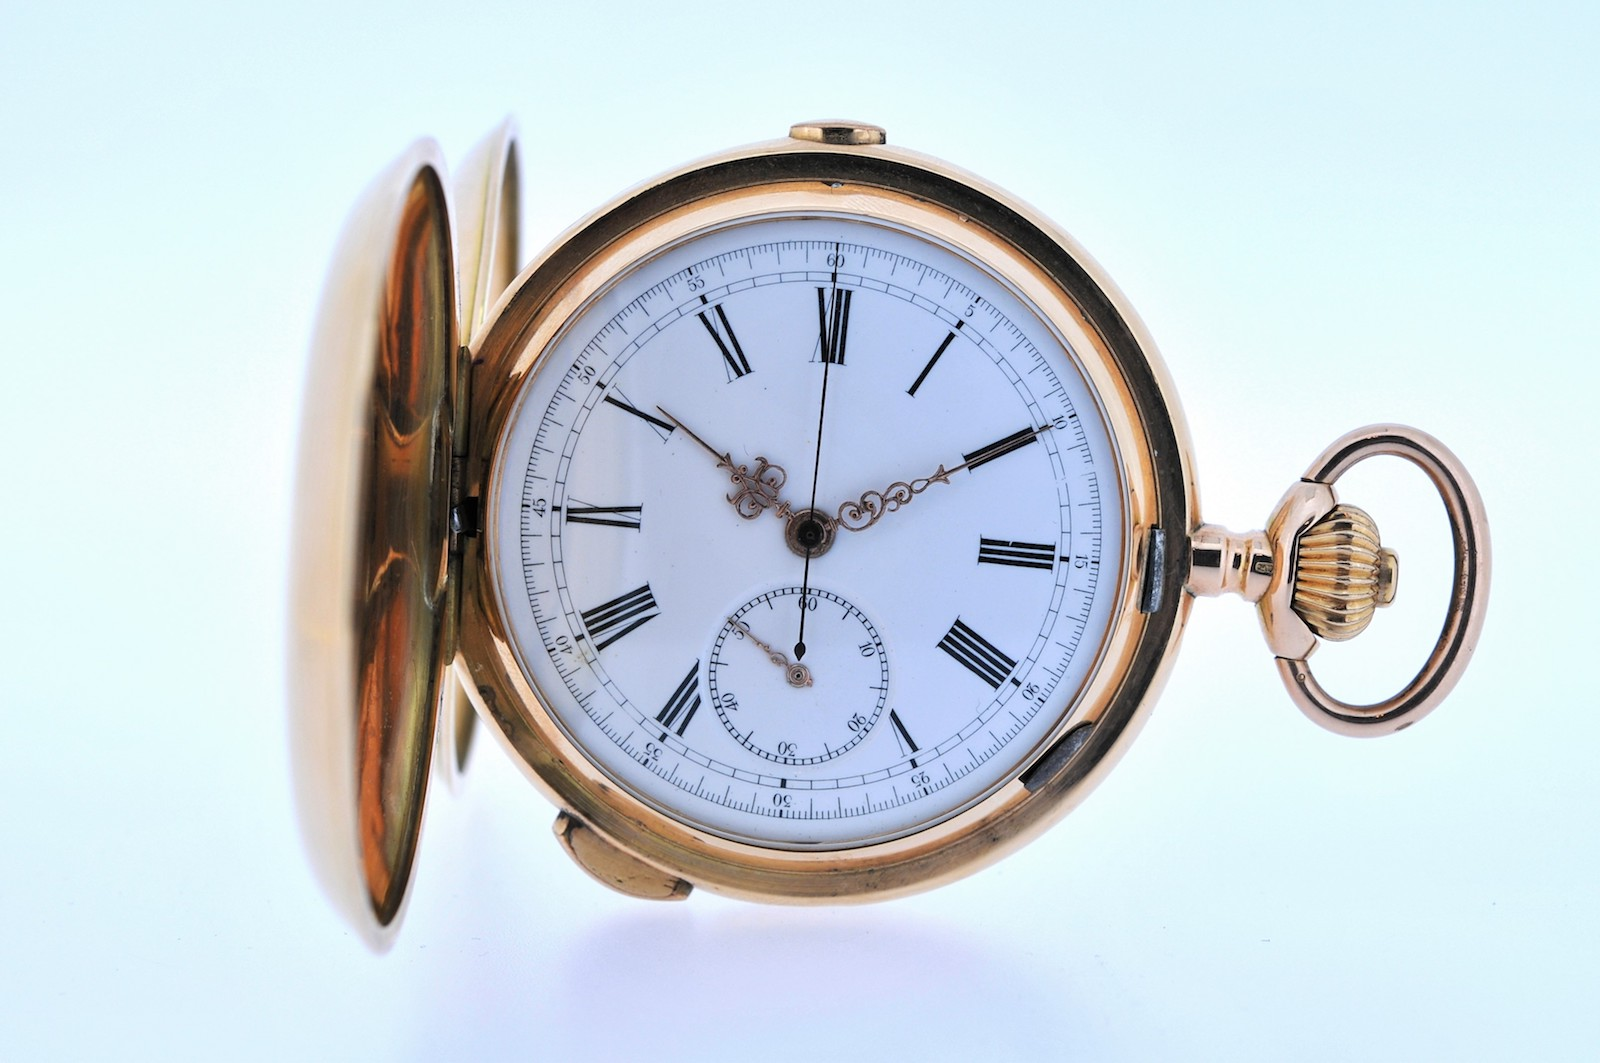 #30 Quarter Hours Repeating Watch | Viertelstundenrepetierer Image